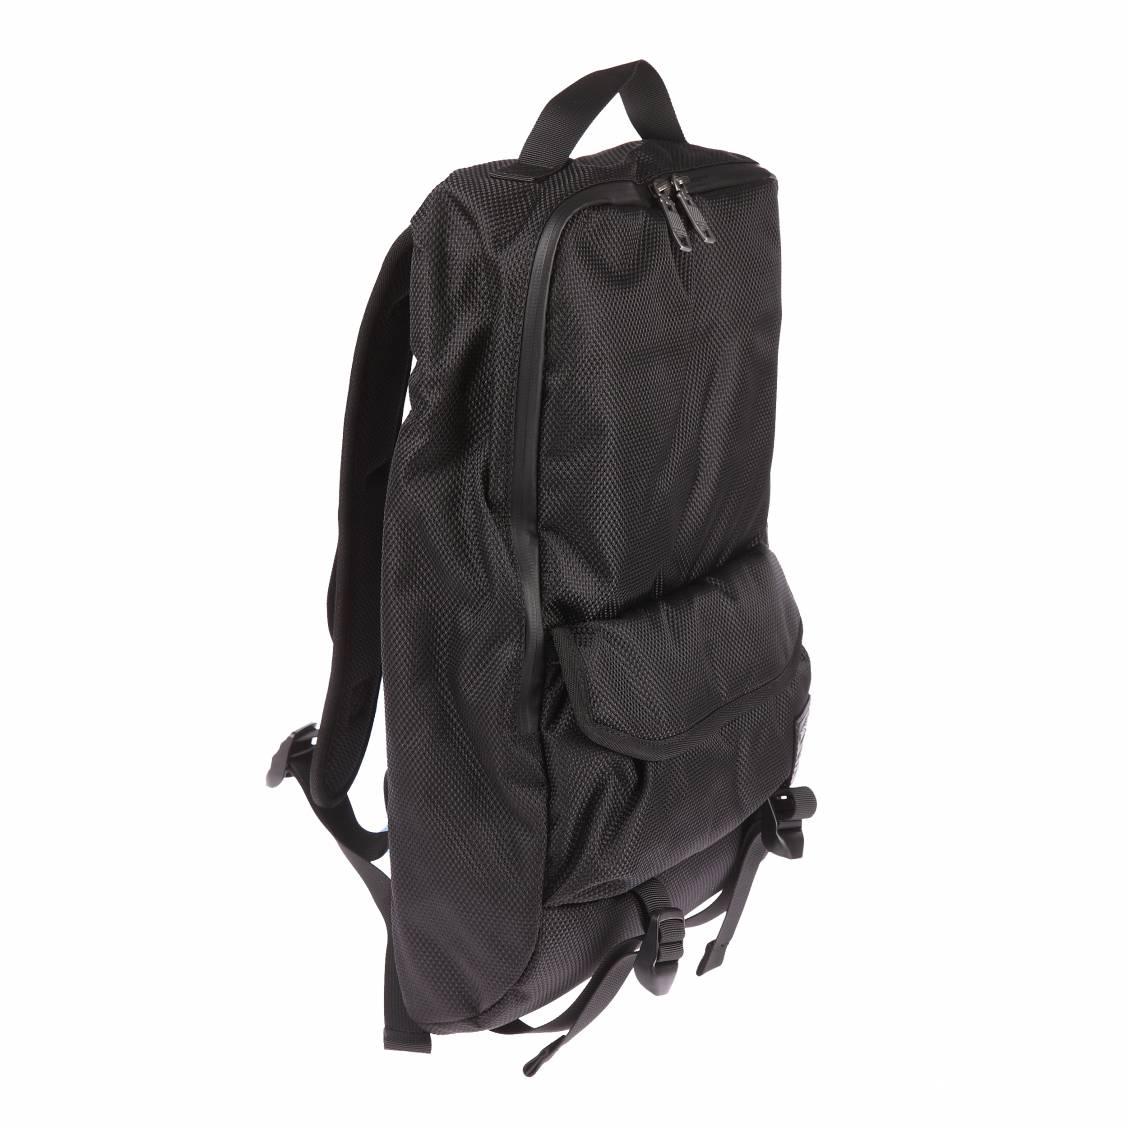 sac dos diesel close ranks en tissu noir quadrill rue des hommes. Black Bedroom Furniture Sets. Home Design Ideas